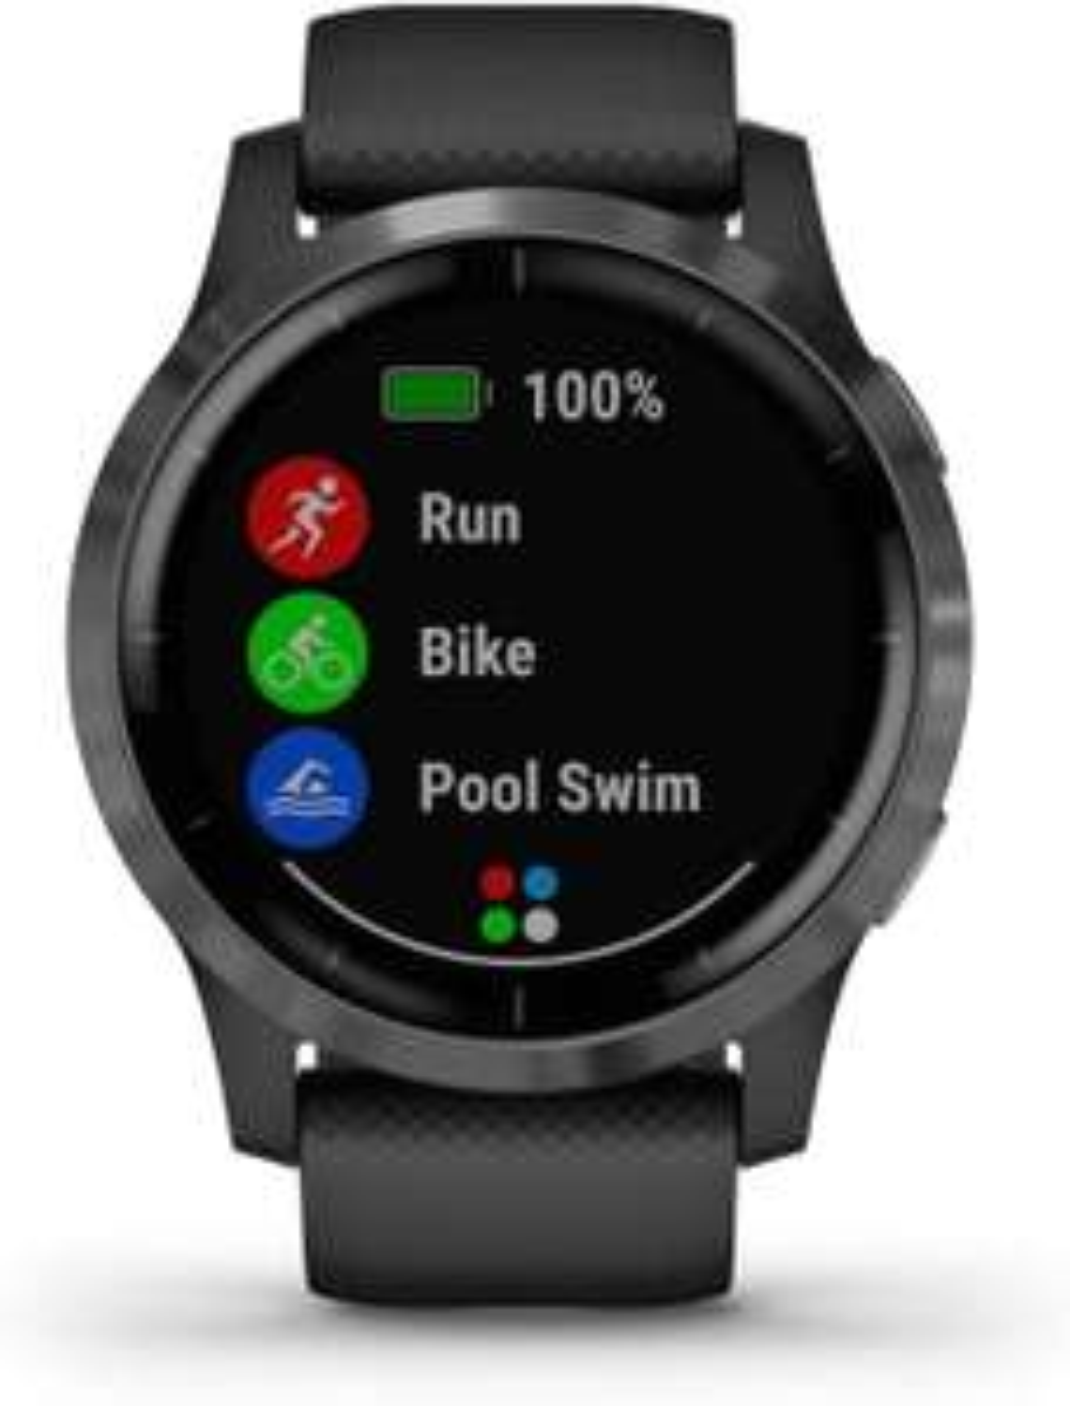 Montre connectée GPS Garmin Vivoactive 4 Black/Gunmetal (via ODR de 50€)